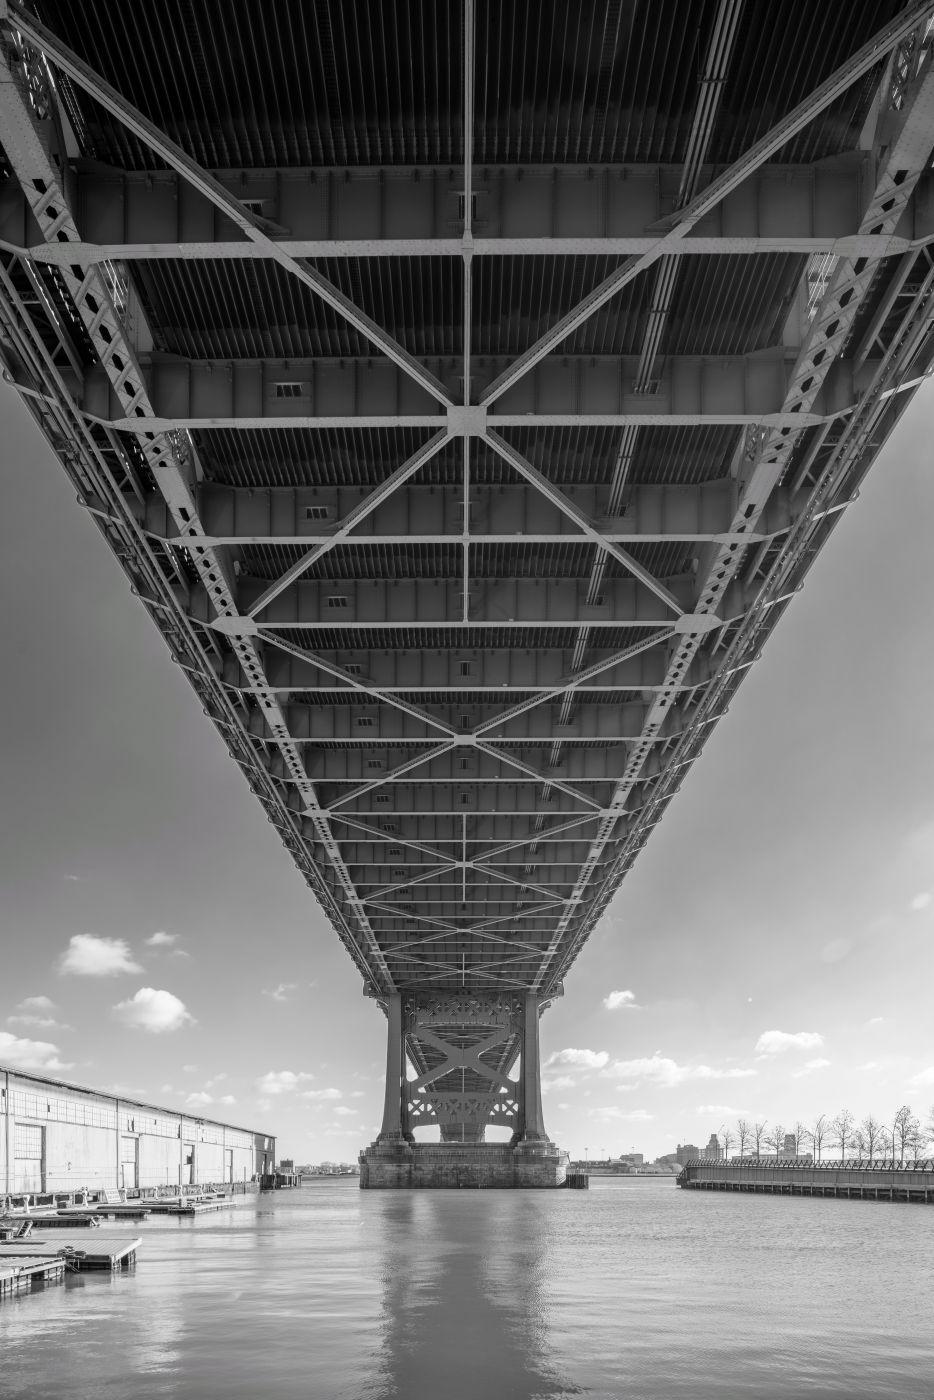 Under the Ben Franklin Bridge.  Philadelphia, PA, USA